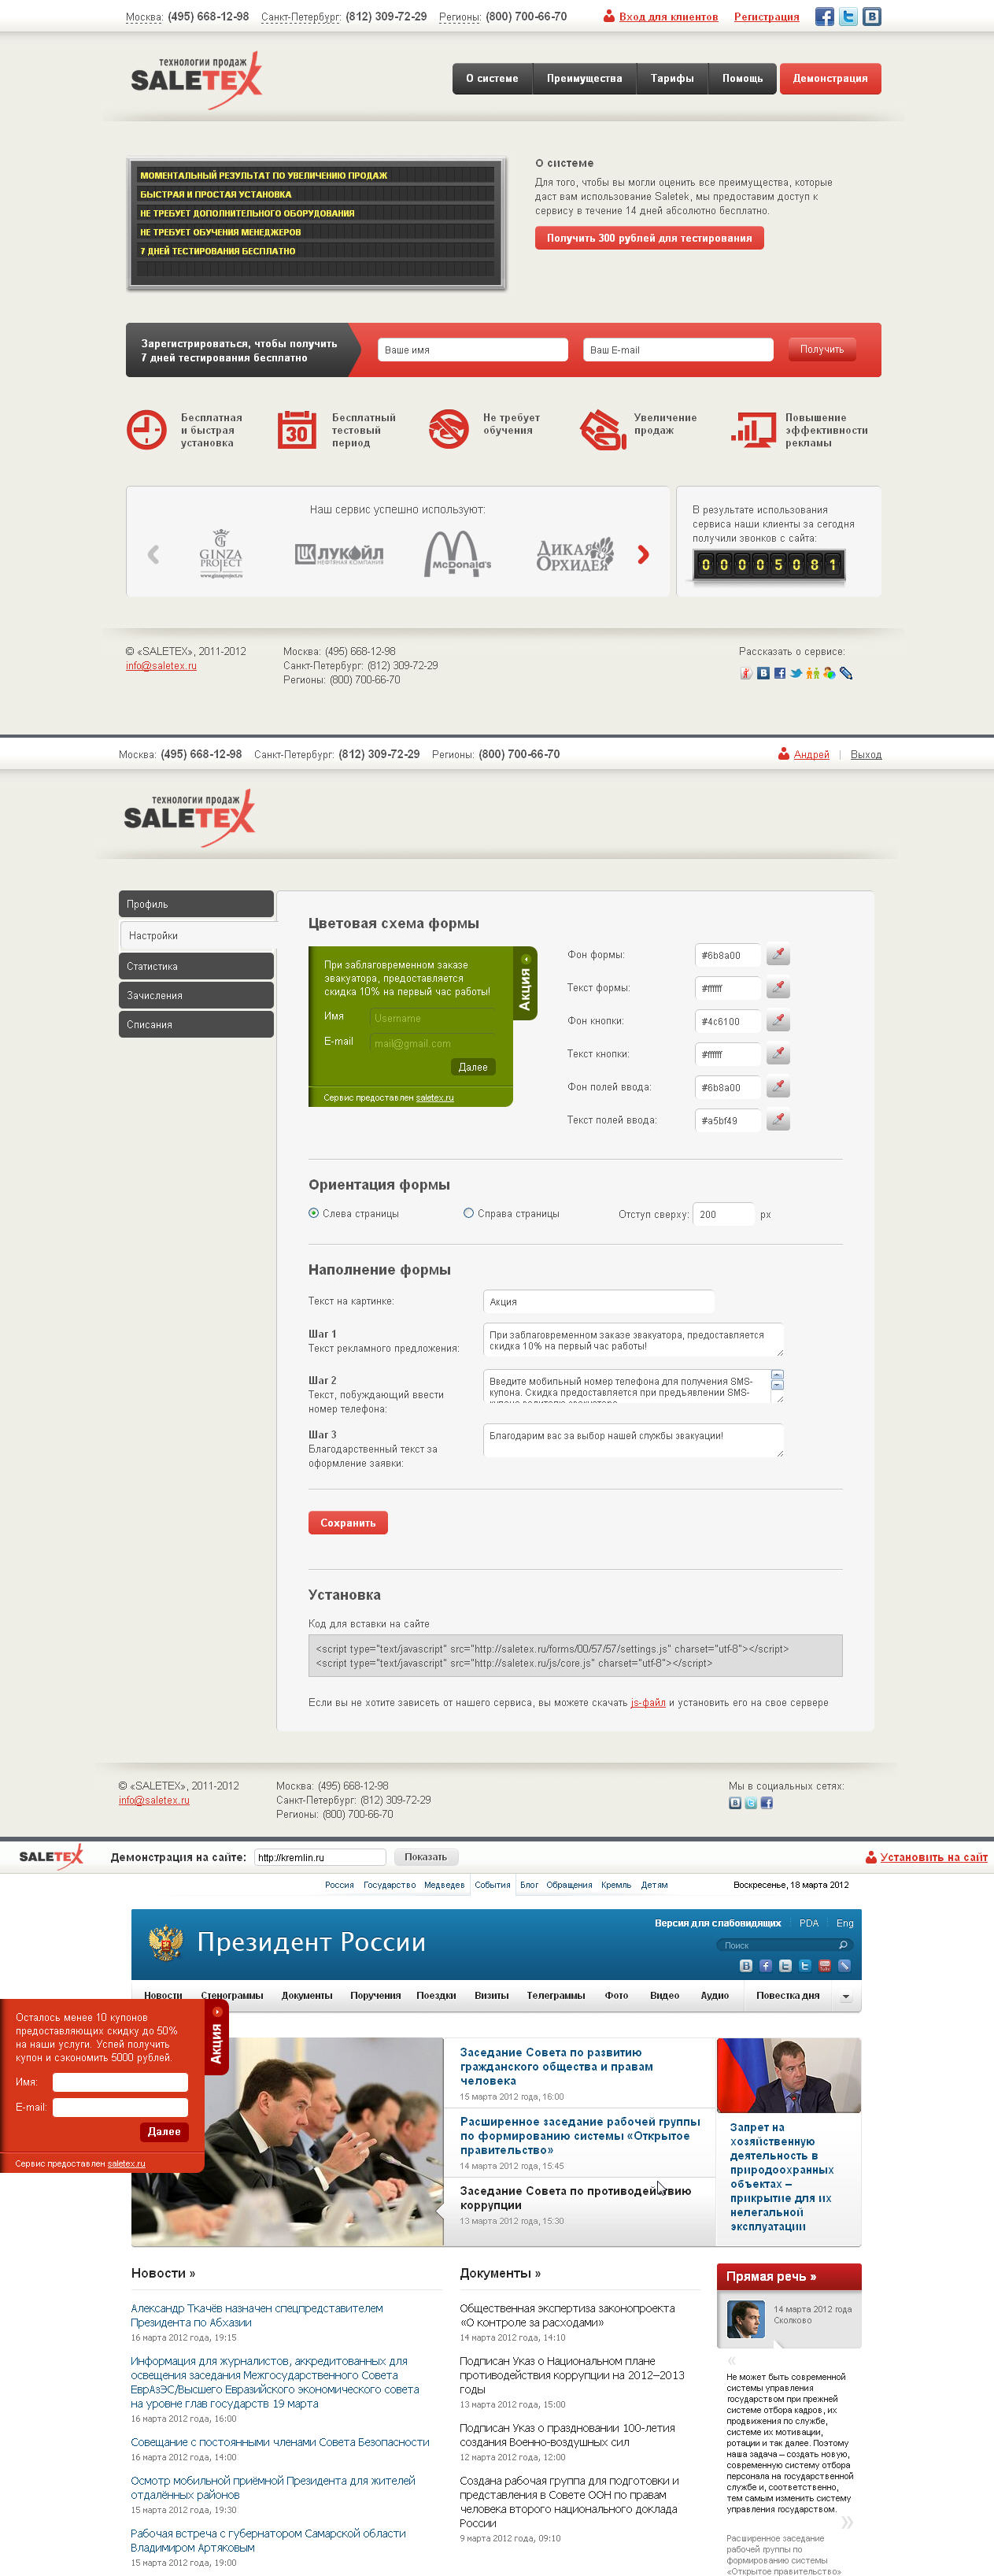 Сервис звонков Saletex.ru